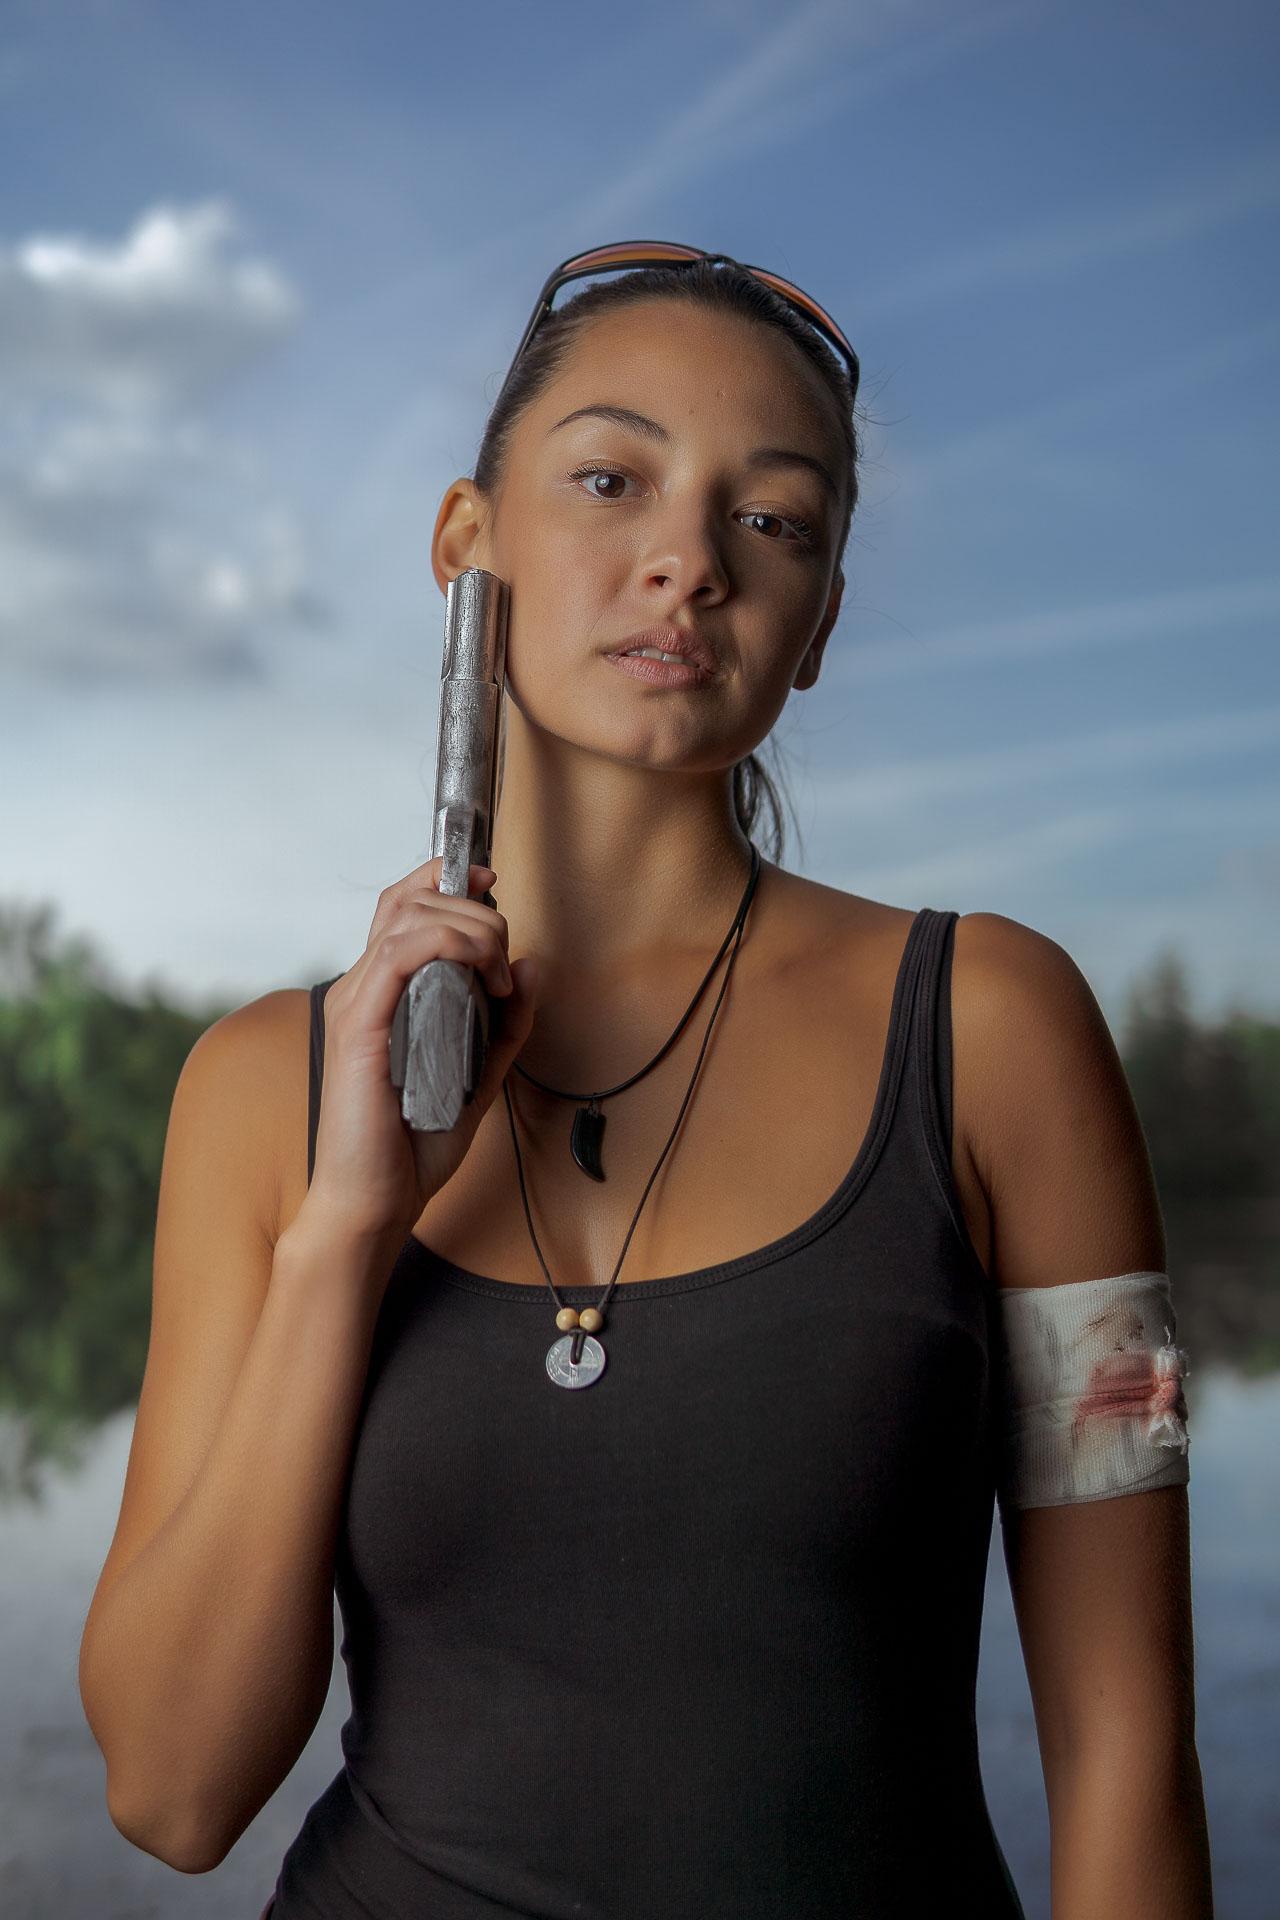 Kim mit Waffe an der Wange